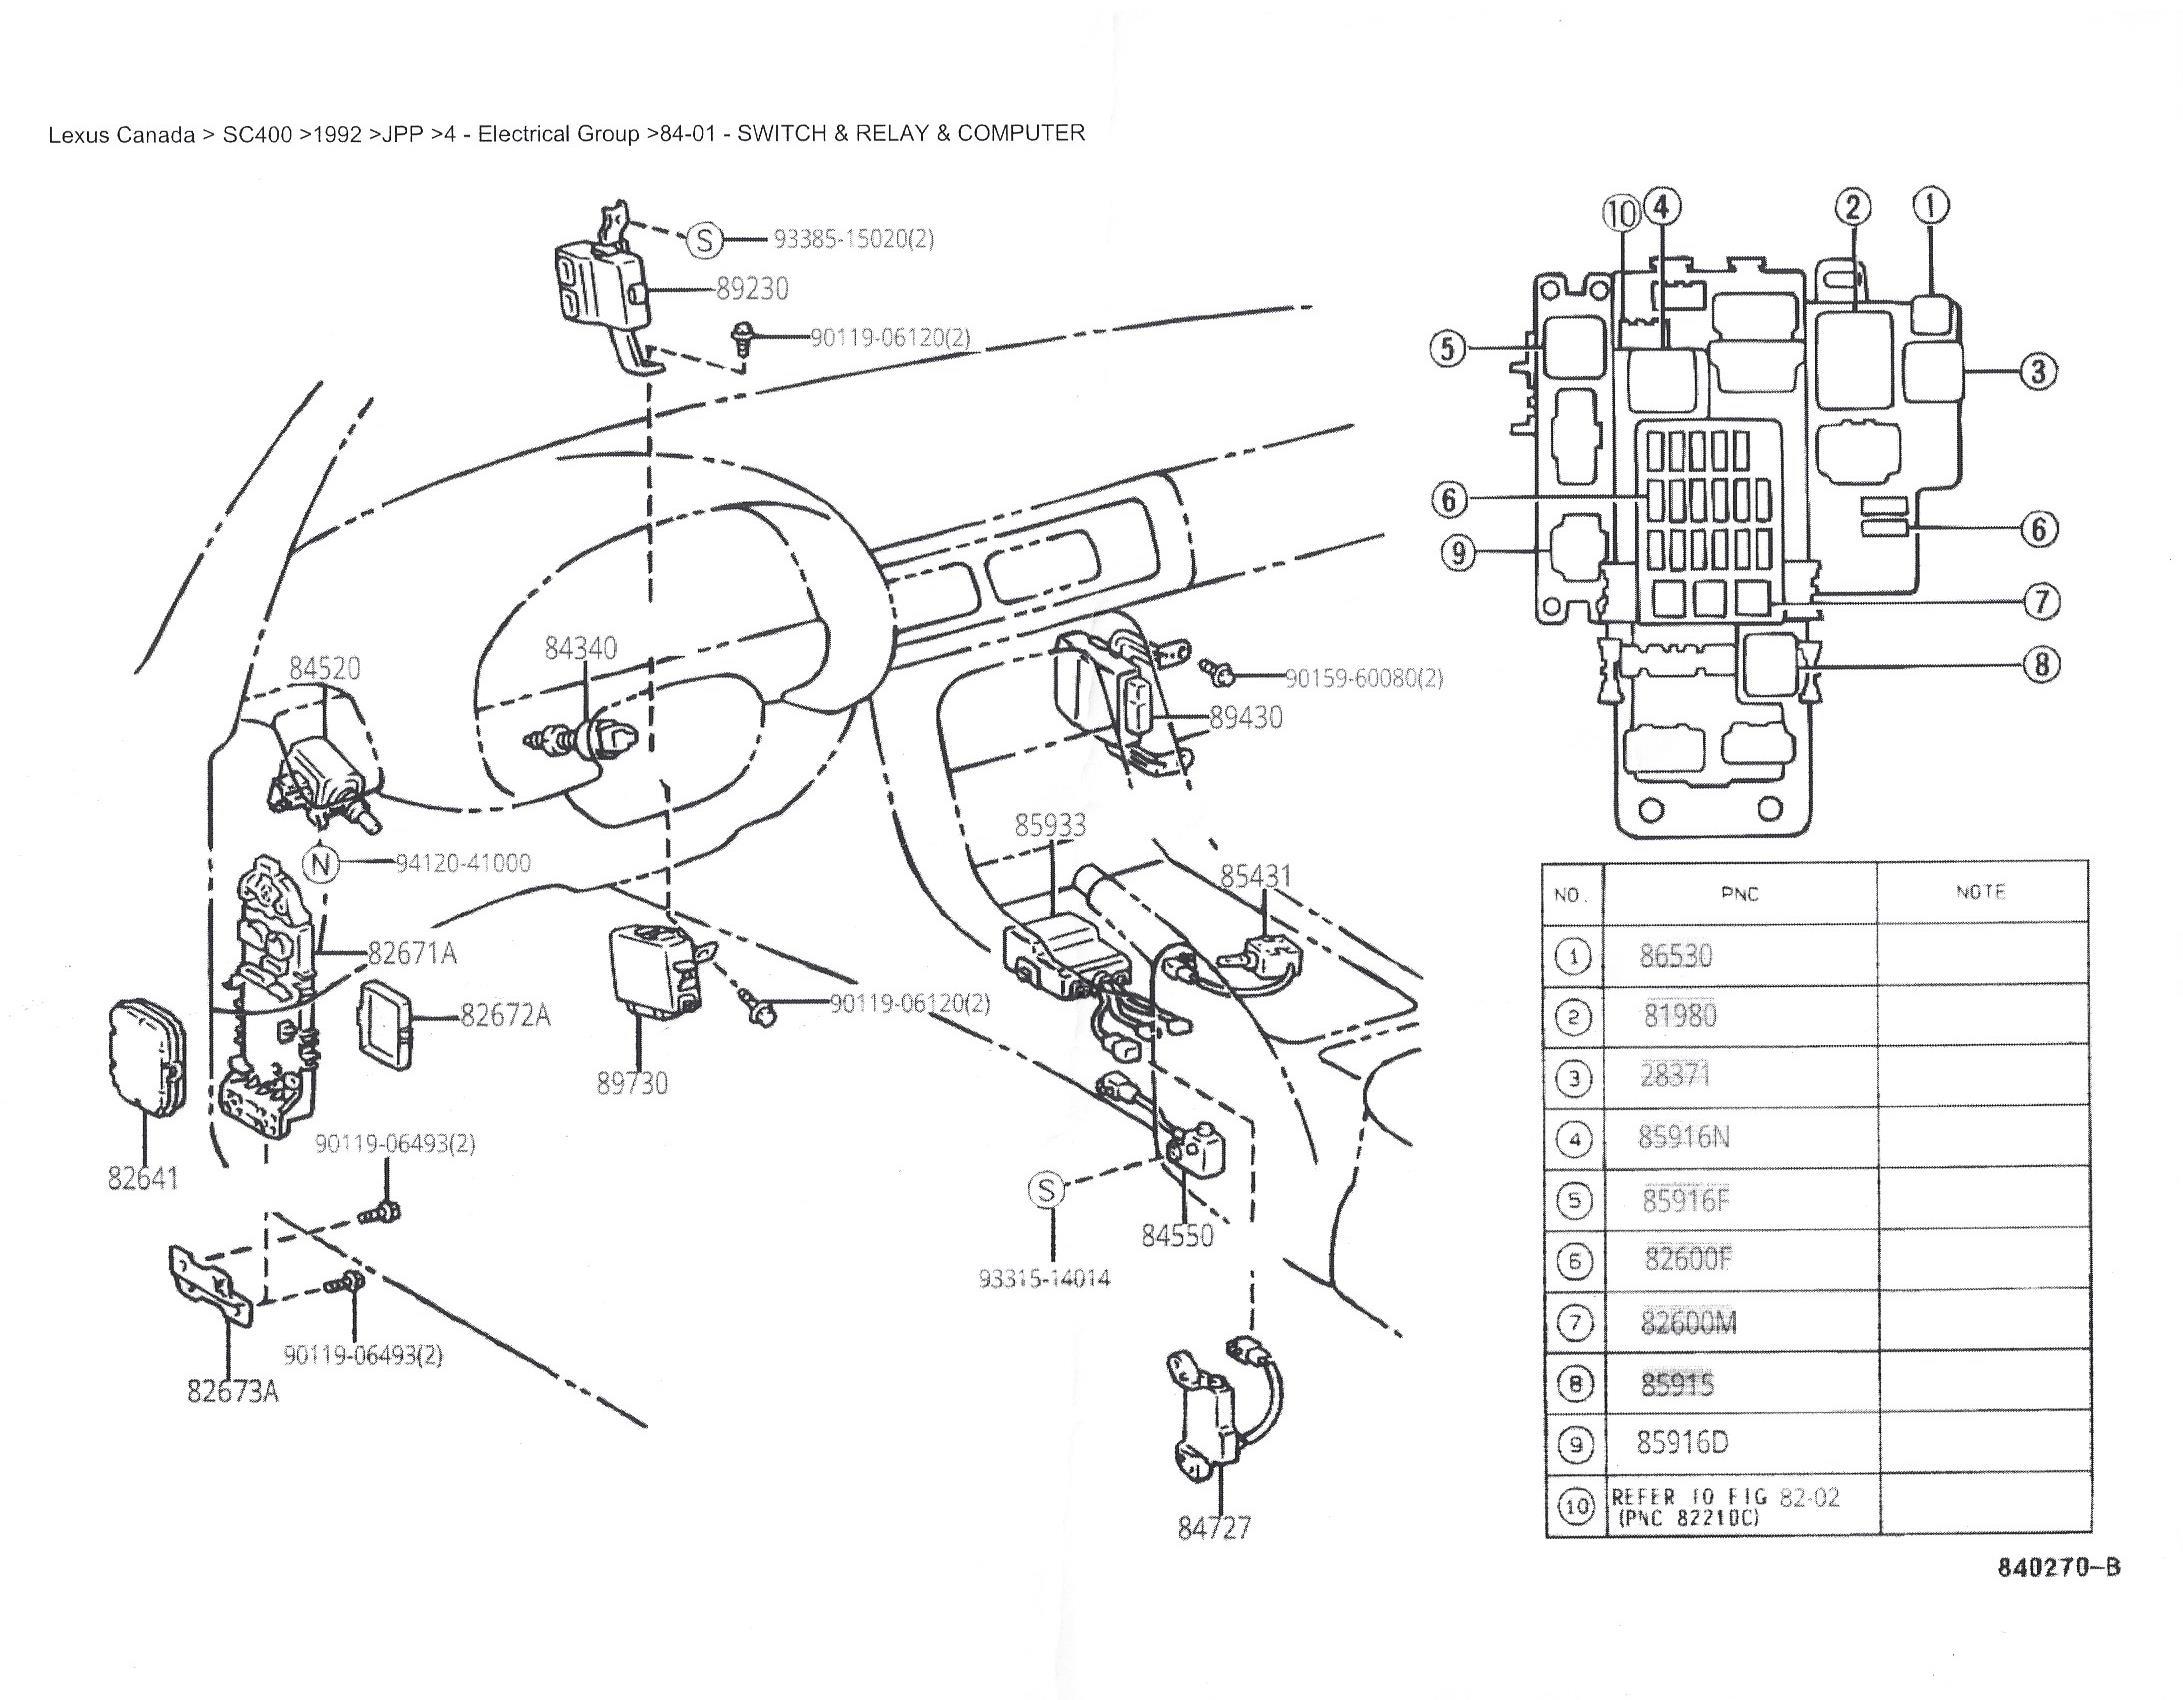 Fz 0363 Toyota Soarer Fuse Box Location Schematic Wiring